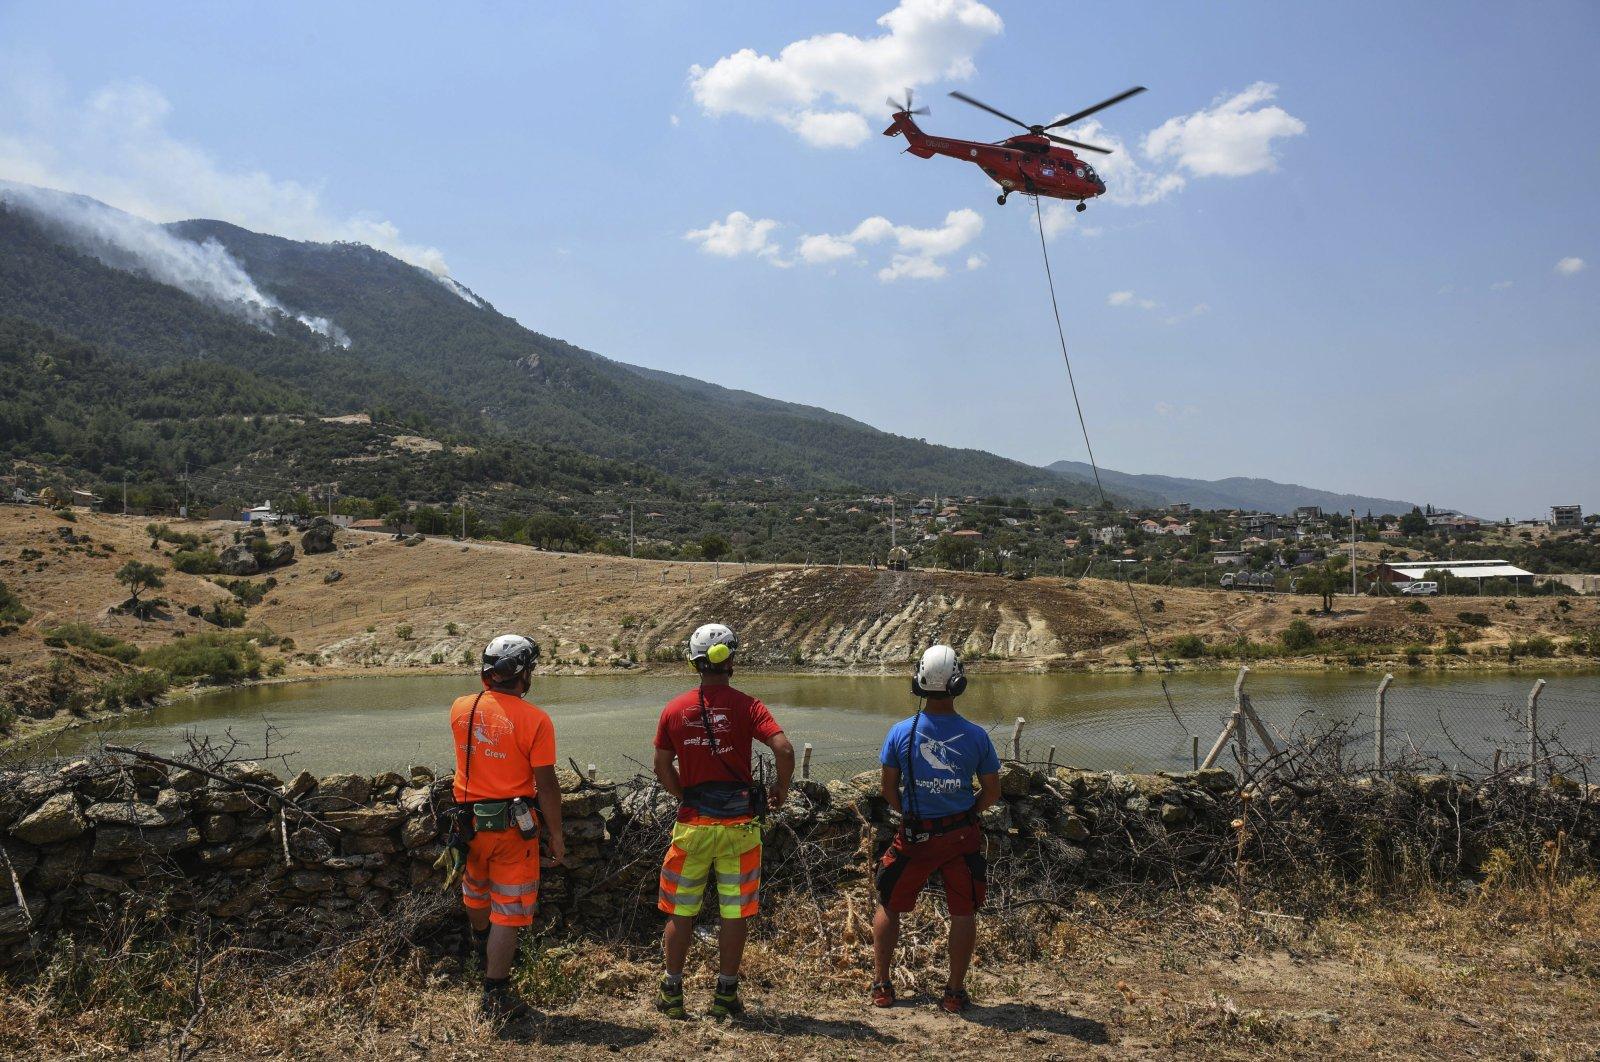 A firefighting helicopter takes water from a lake in Akçaova Village, near Çine, Aydın, northwestern Turkey, Aug. 7, 2021. (AP Photo)